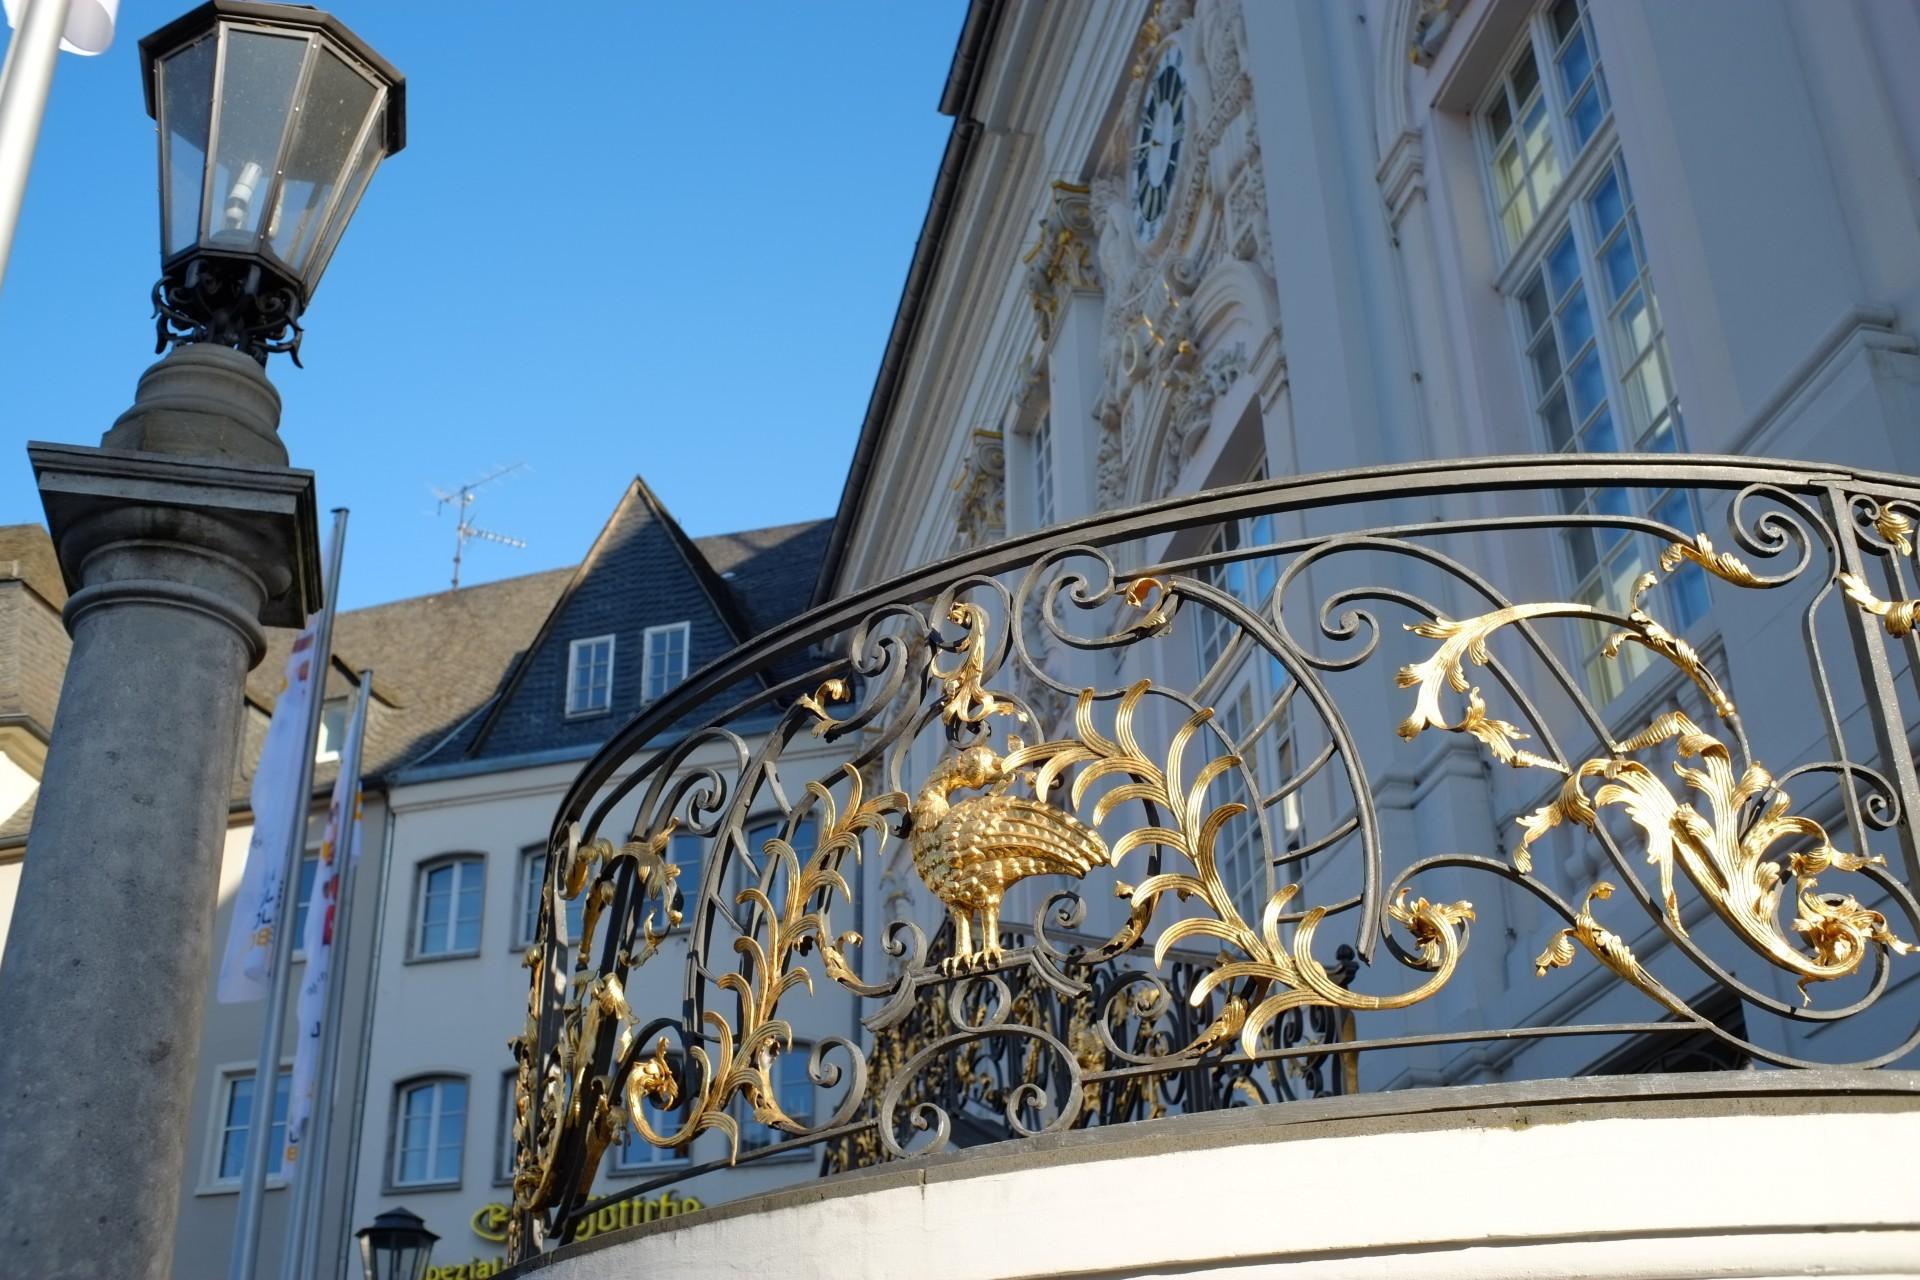 Rathaus 1/420sec ISO-200 135mm